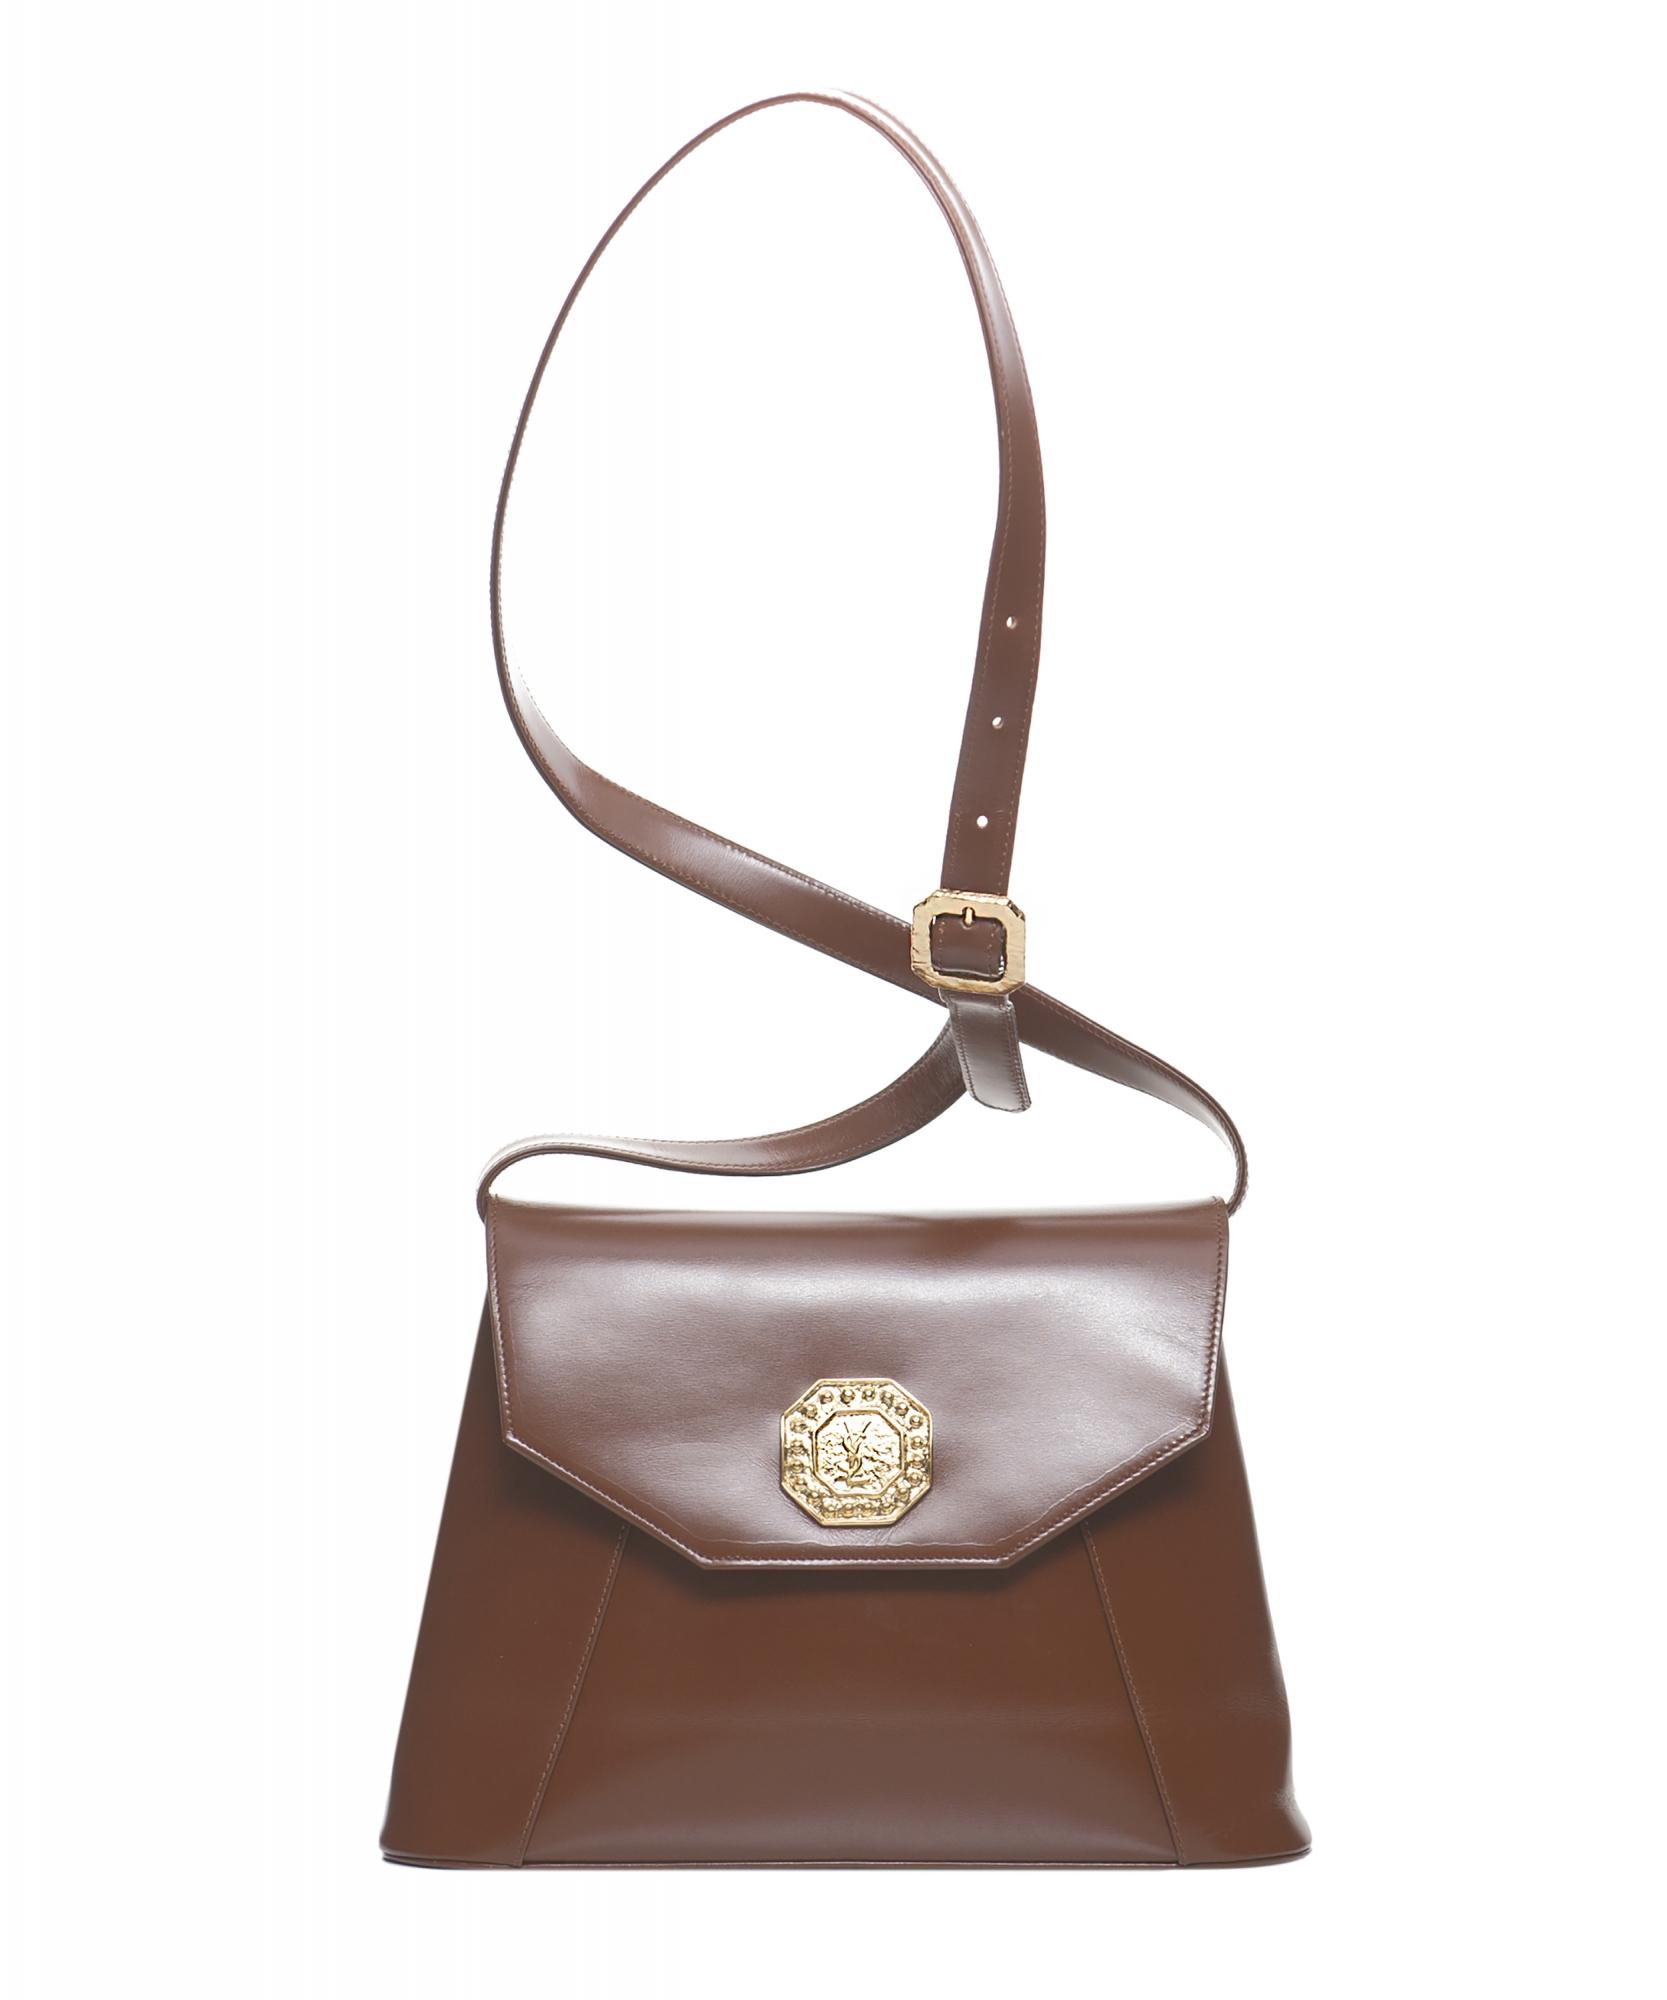 Yves Saint Laurent Brown Leather Shoulder Bag Yves Saint